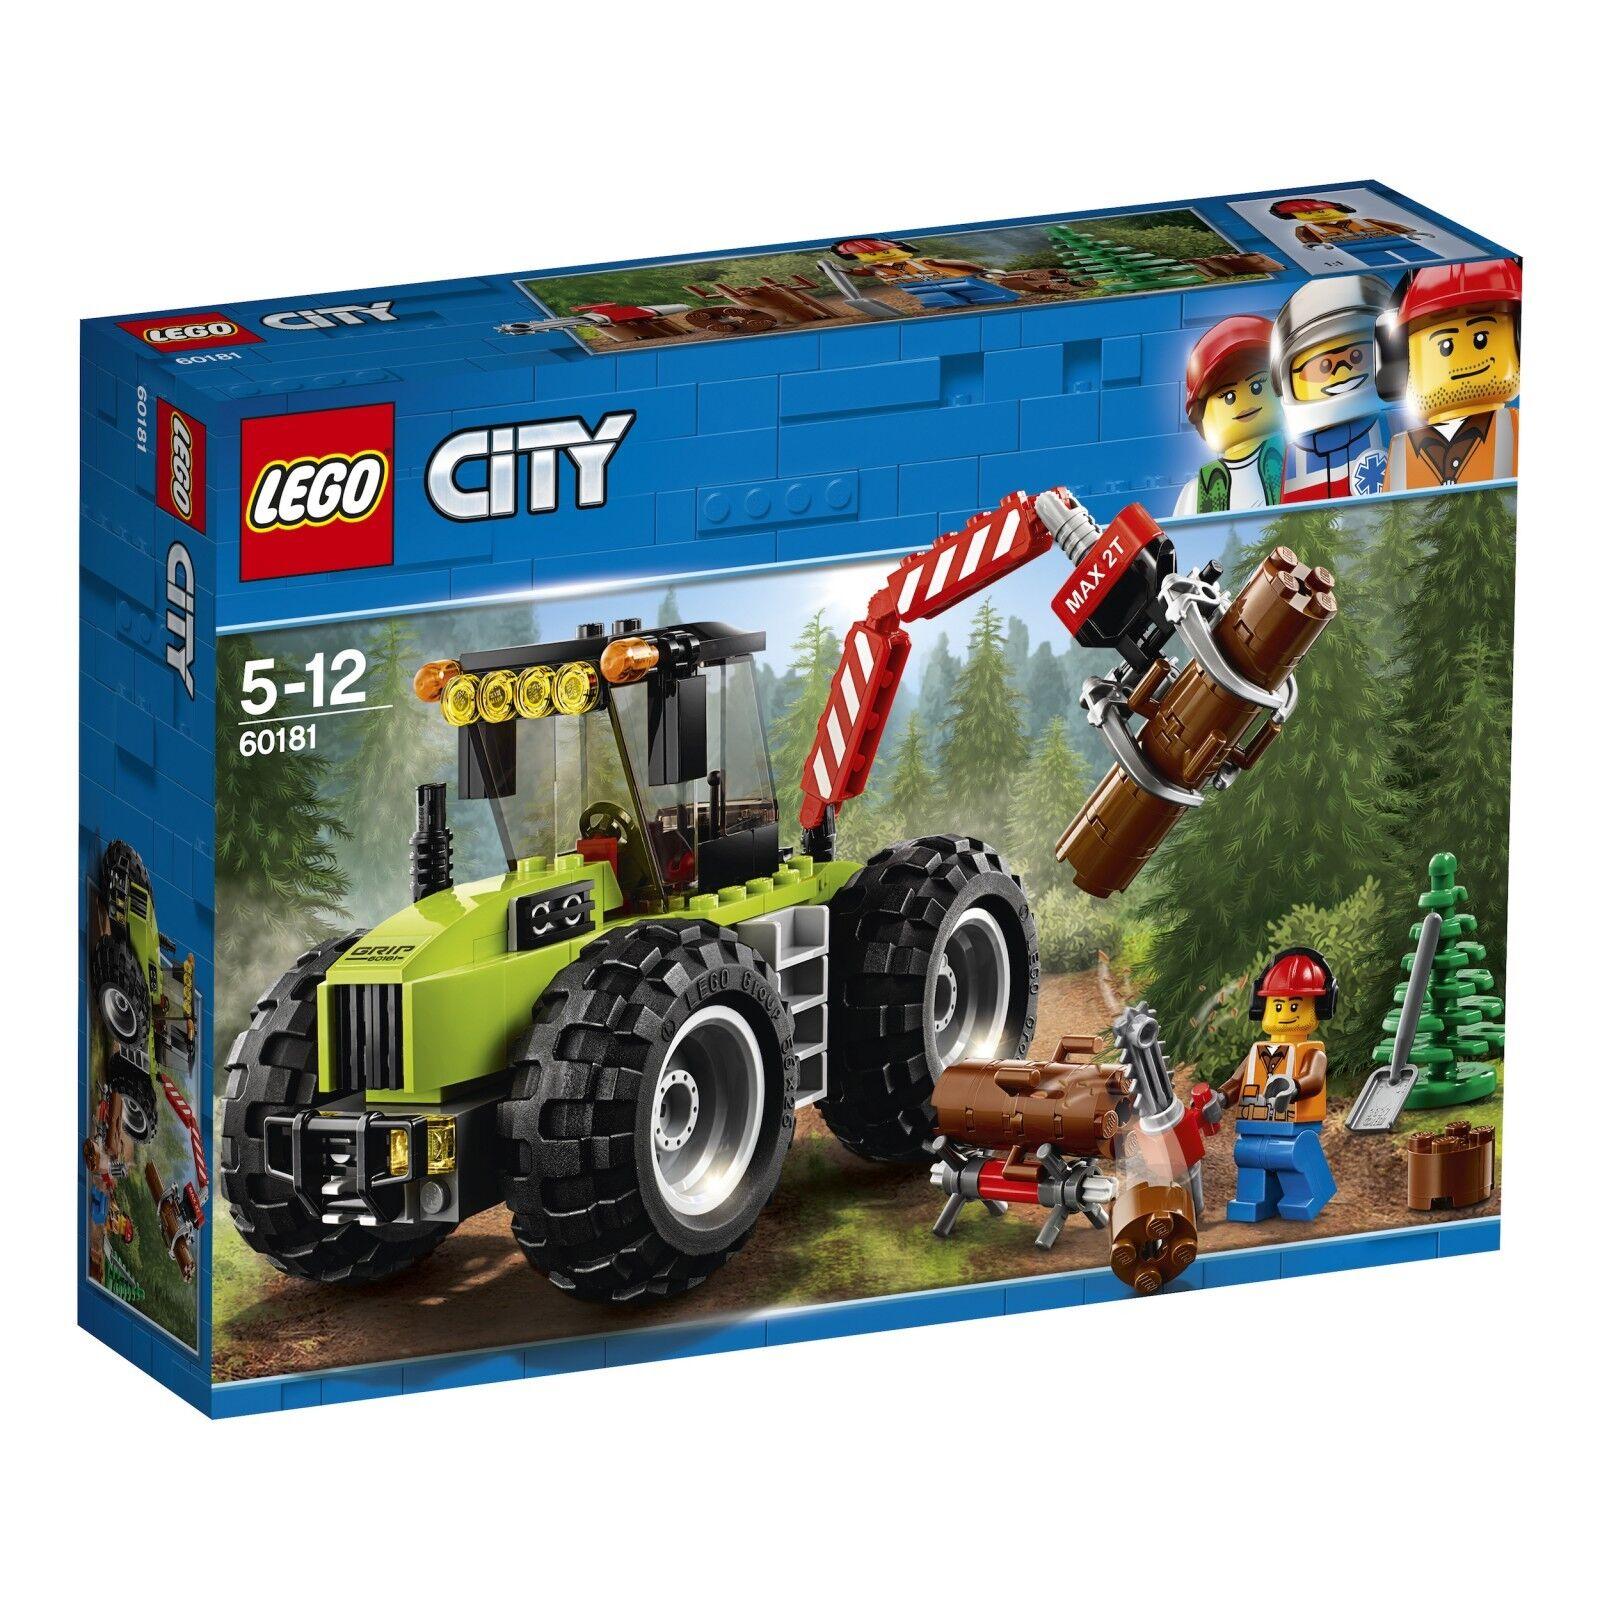 LEGO® City 60181 Forsttraktor NEU OVP_ Forest Tractor NEW MISB NRFB